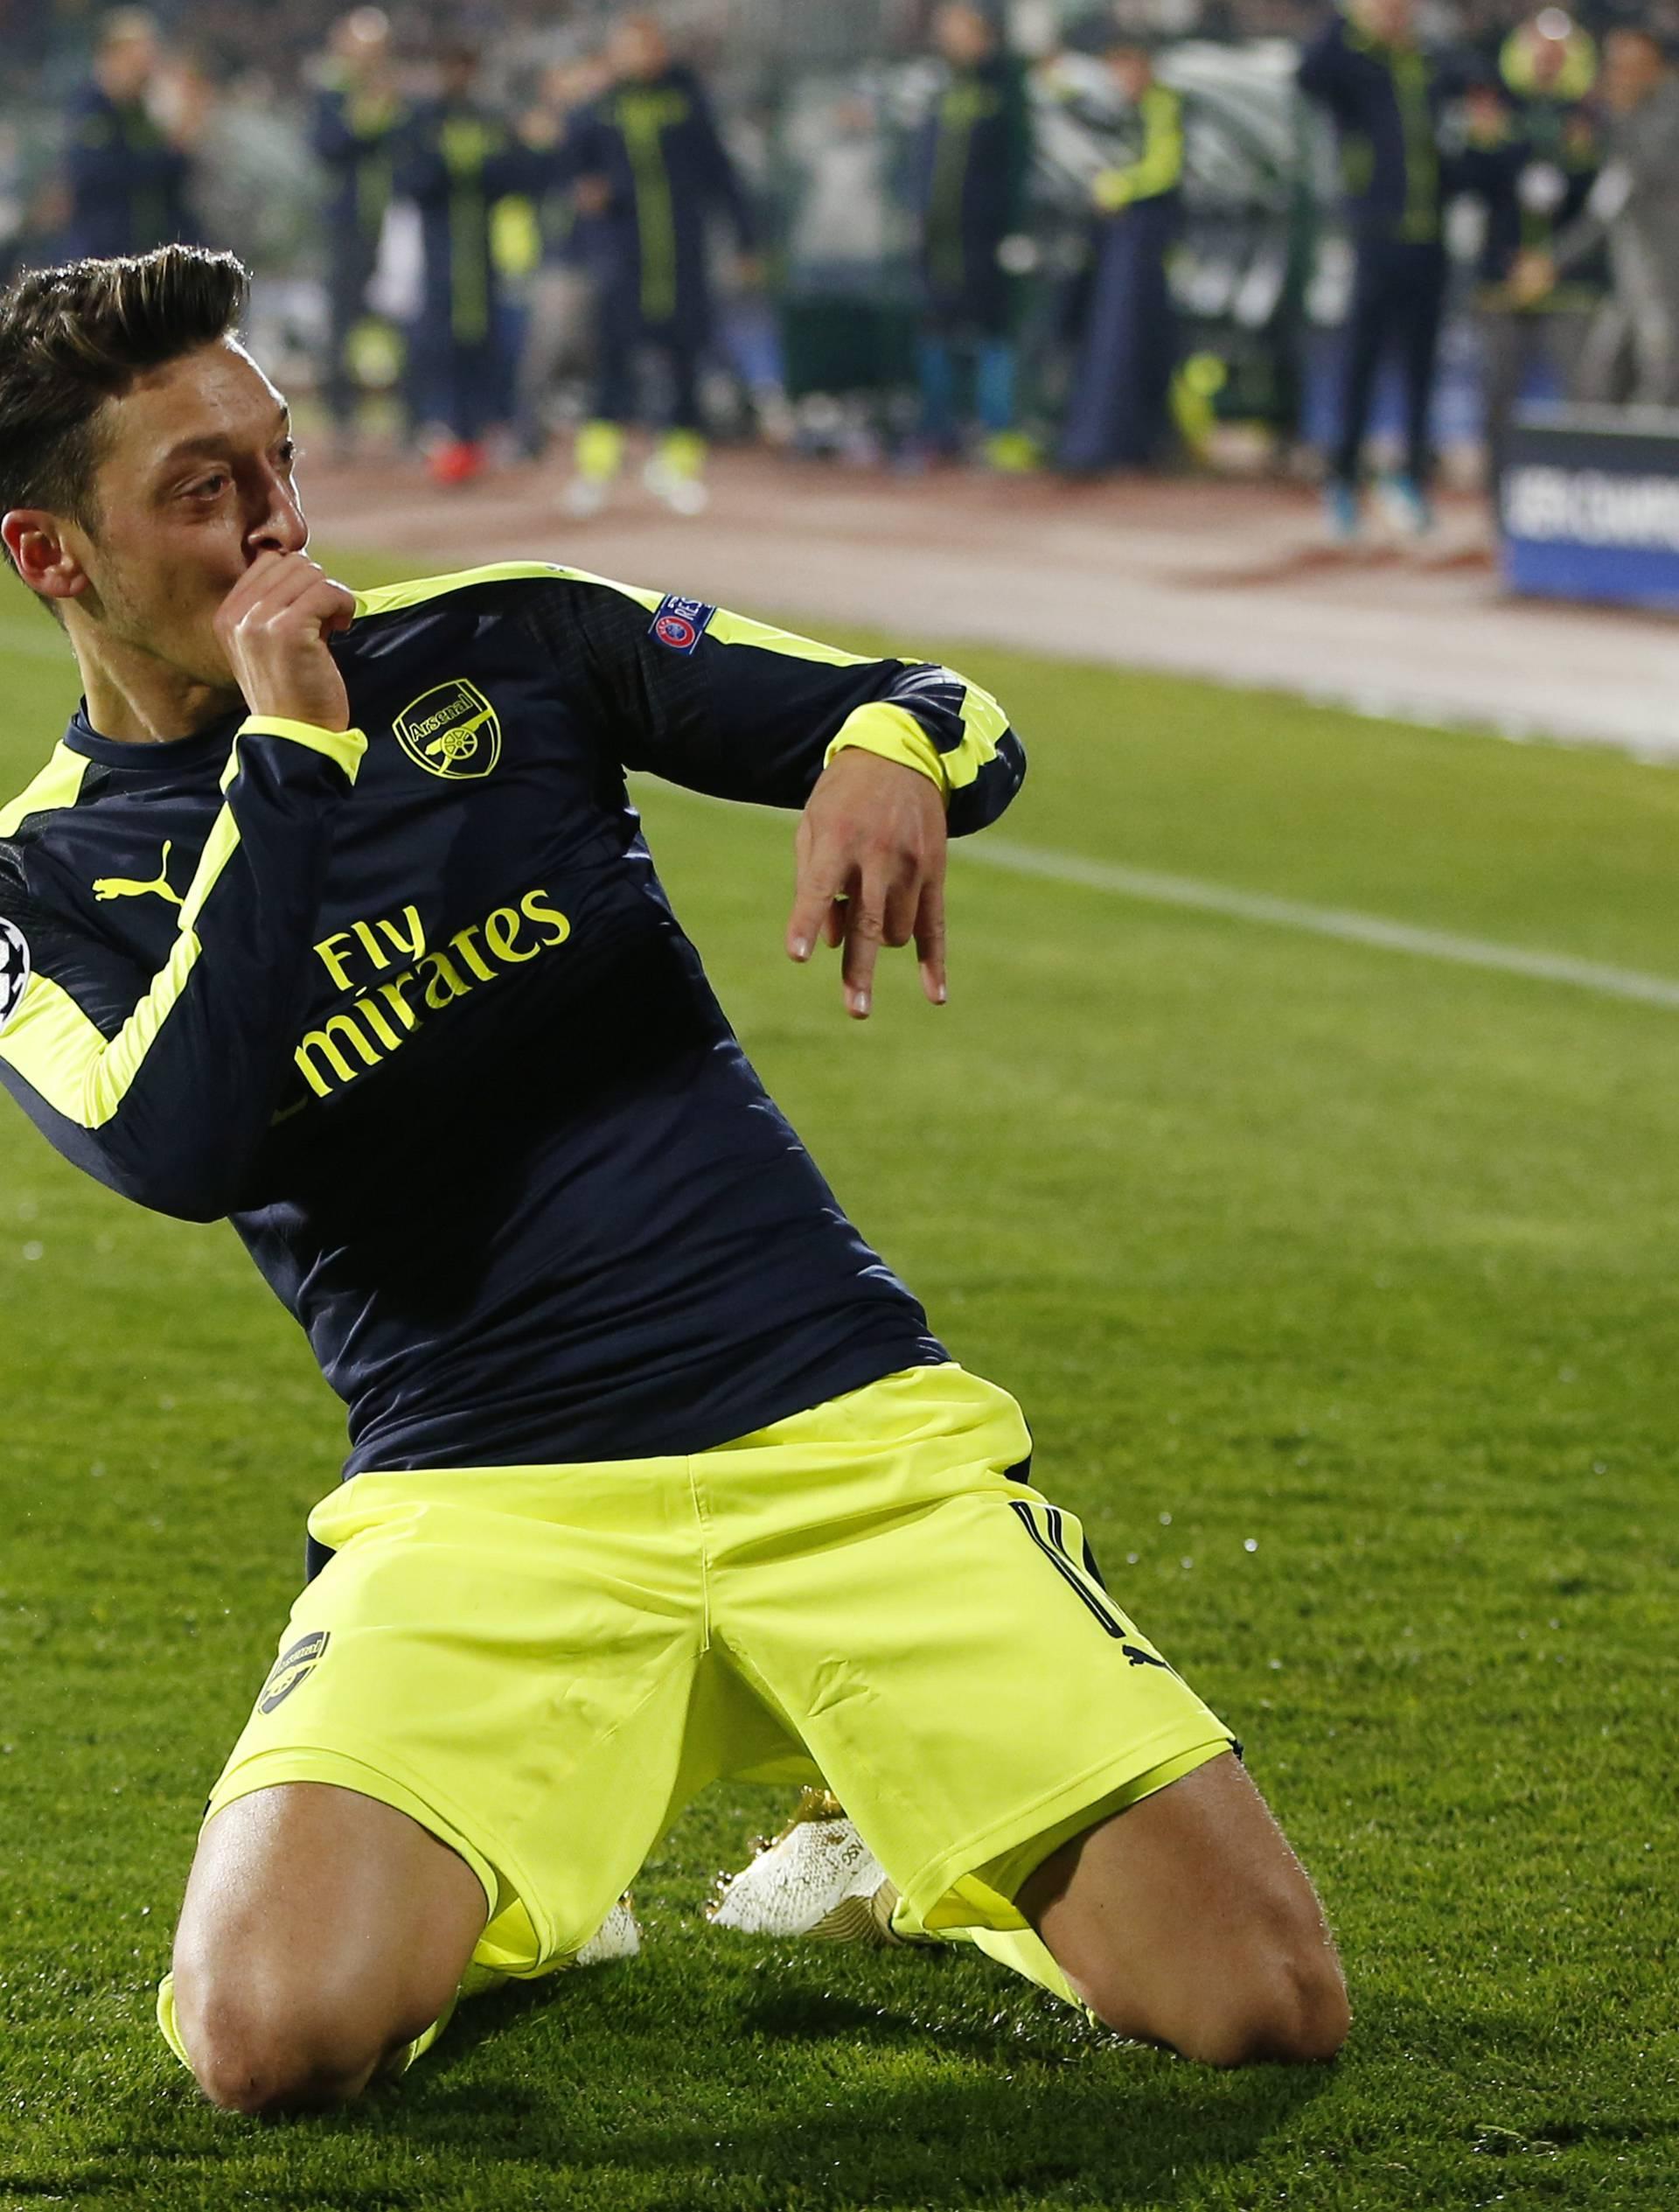 PFC Ludogorets Razgrad v Arsenal - UEFA Champions League Group Stage - Group A